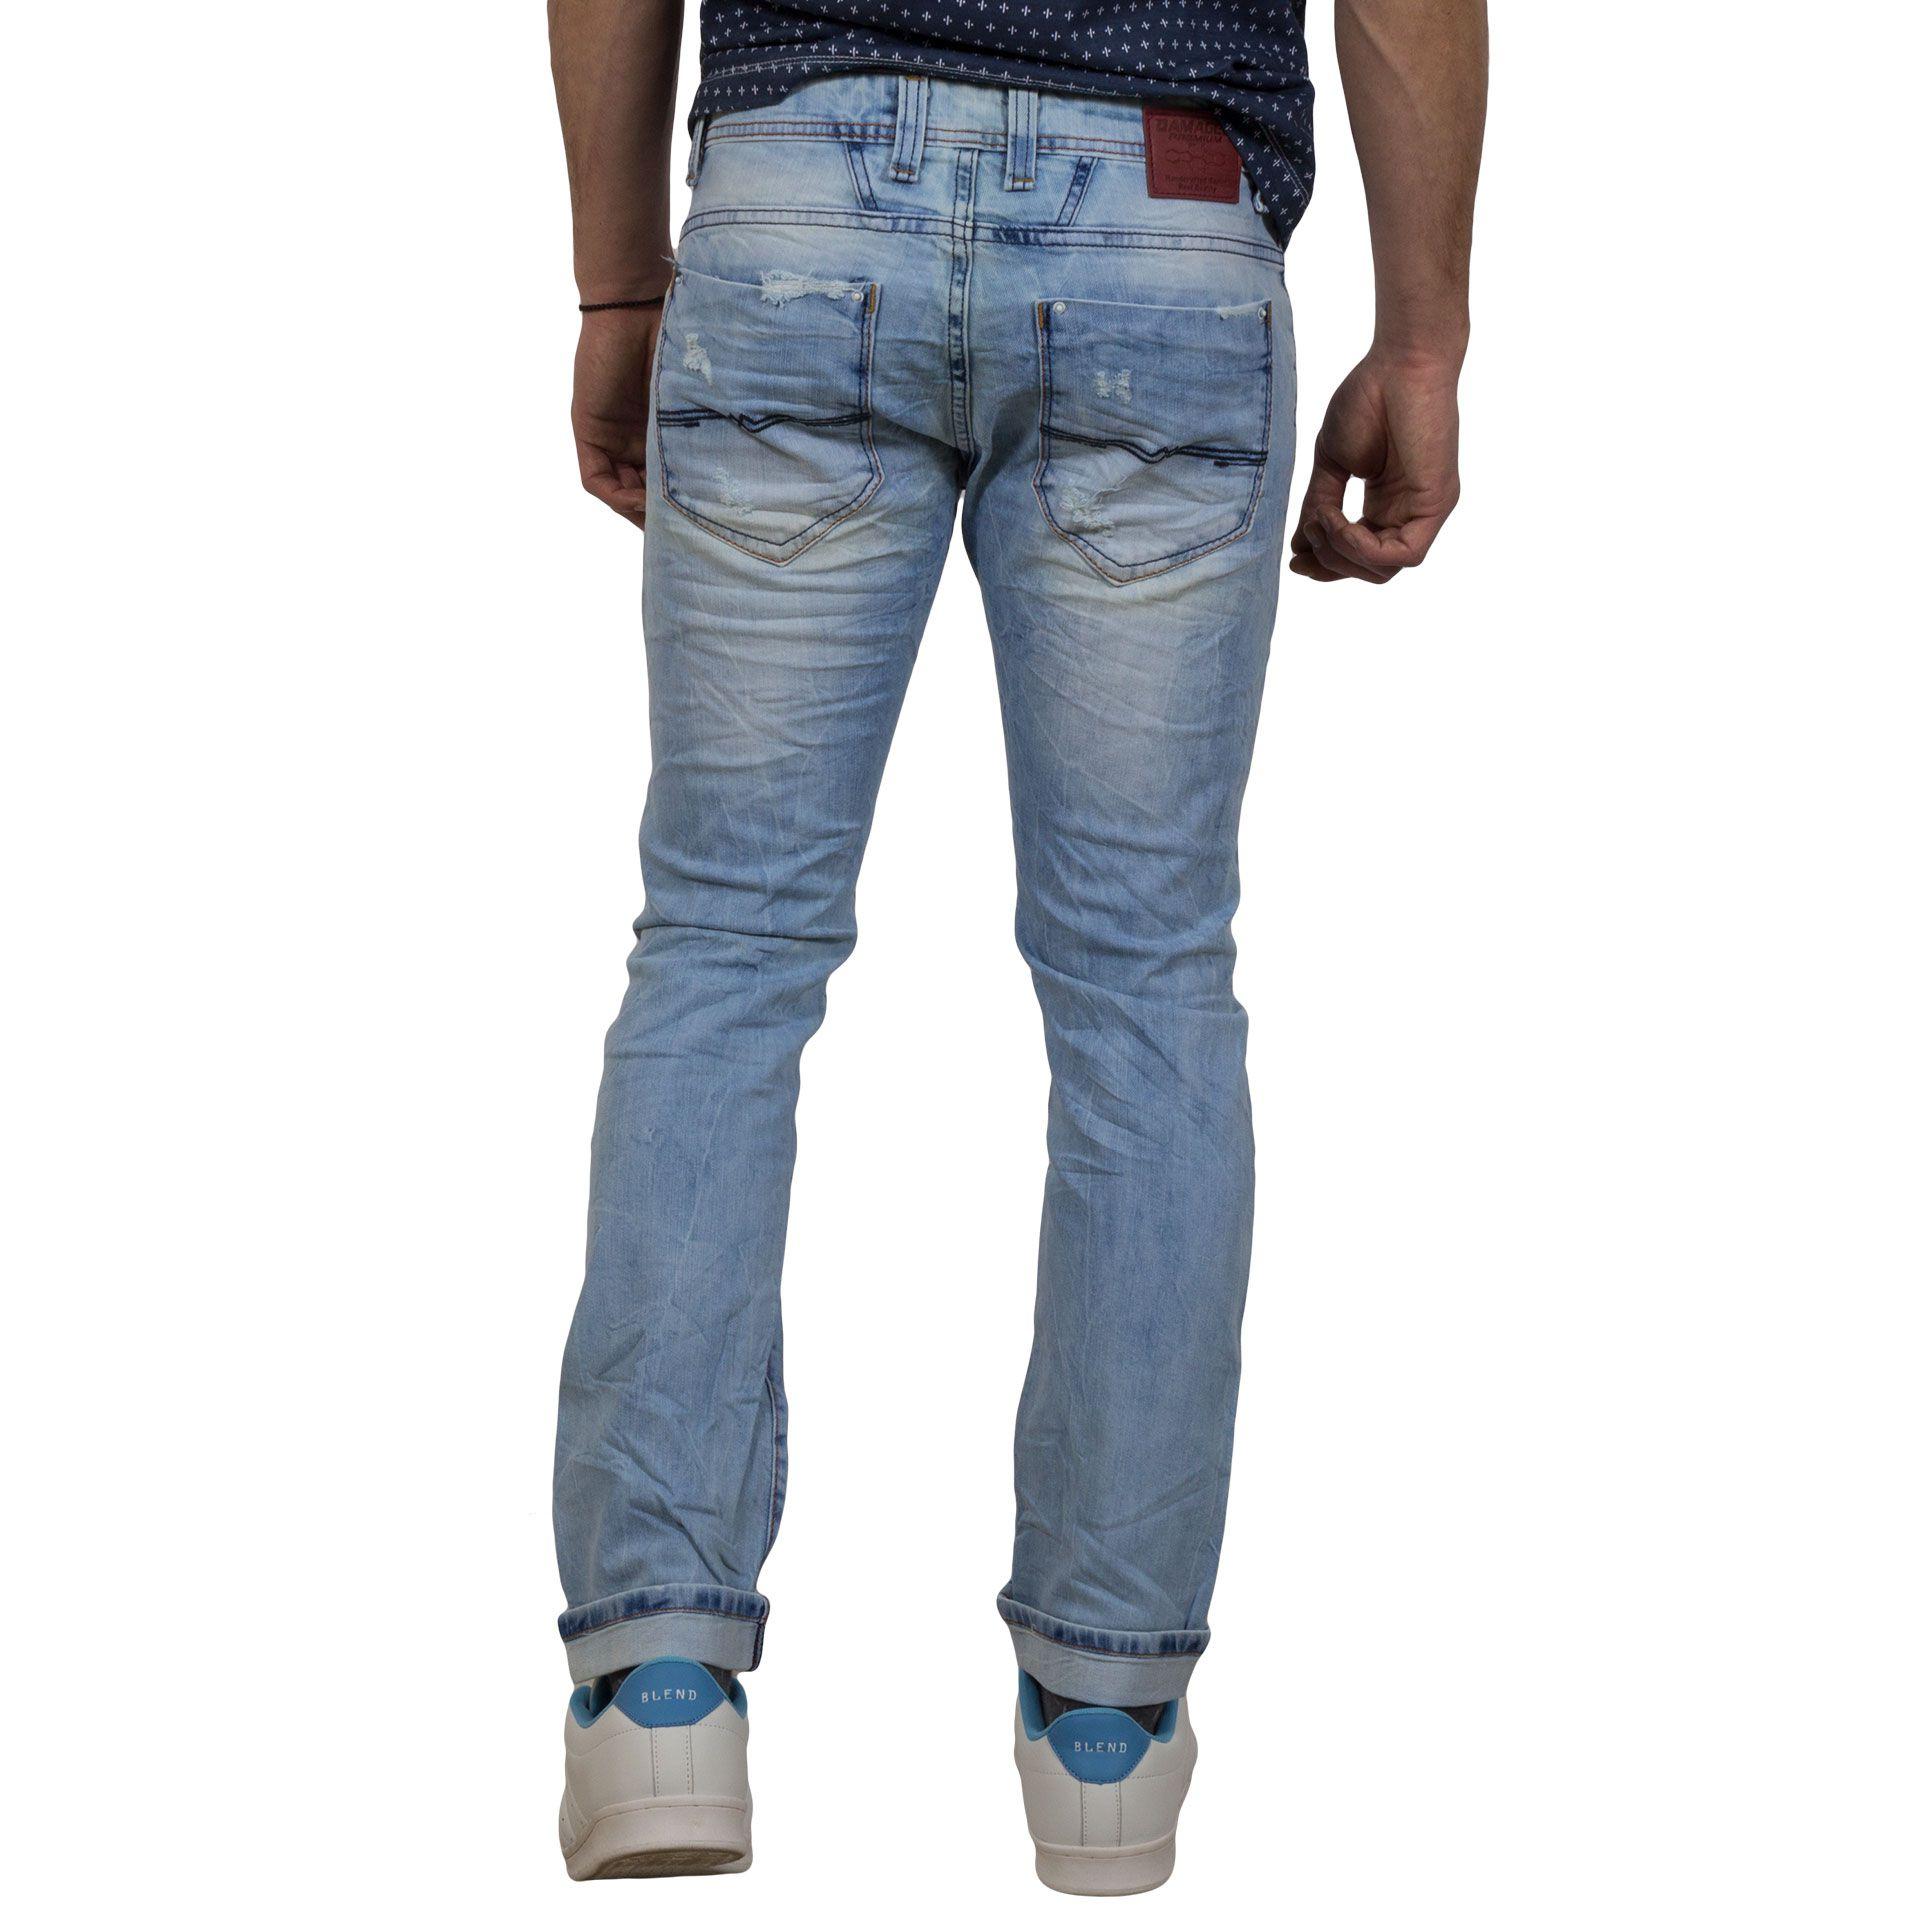 40767f2a5dd4 Τζιν Παντελόνι Damaged Jeans DM2 Γαλάζιο